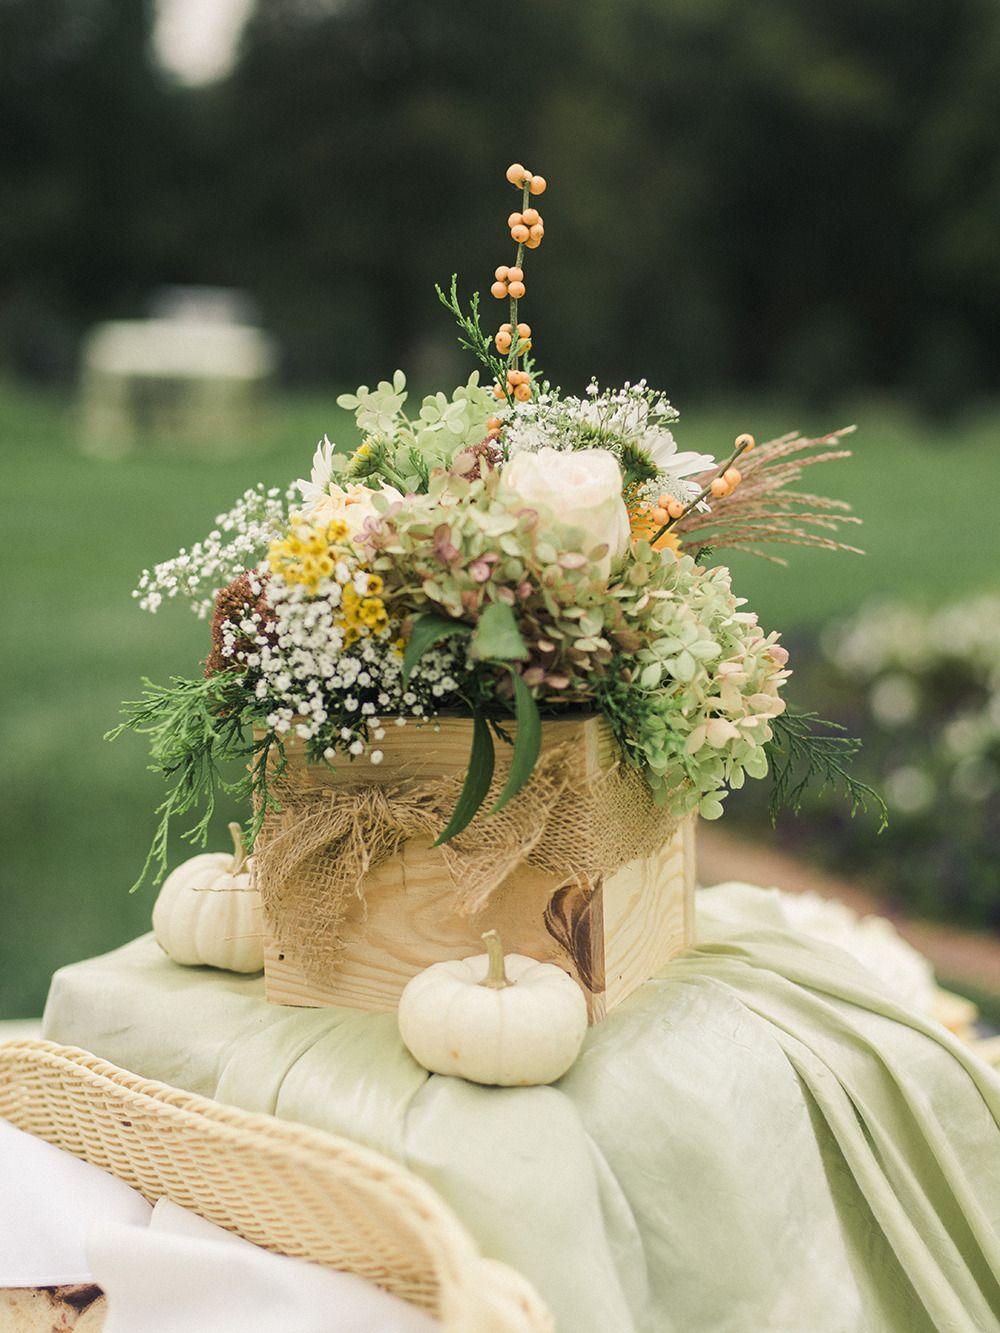 Photography: Krista A. Jones - kristaajones.com/  Read More: http://www.stylemepretty.com/2015/03/11/rustic-manor-wedding/